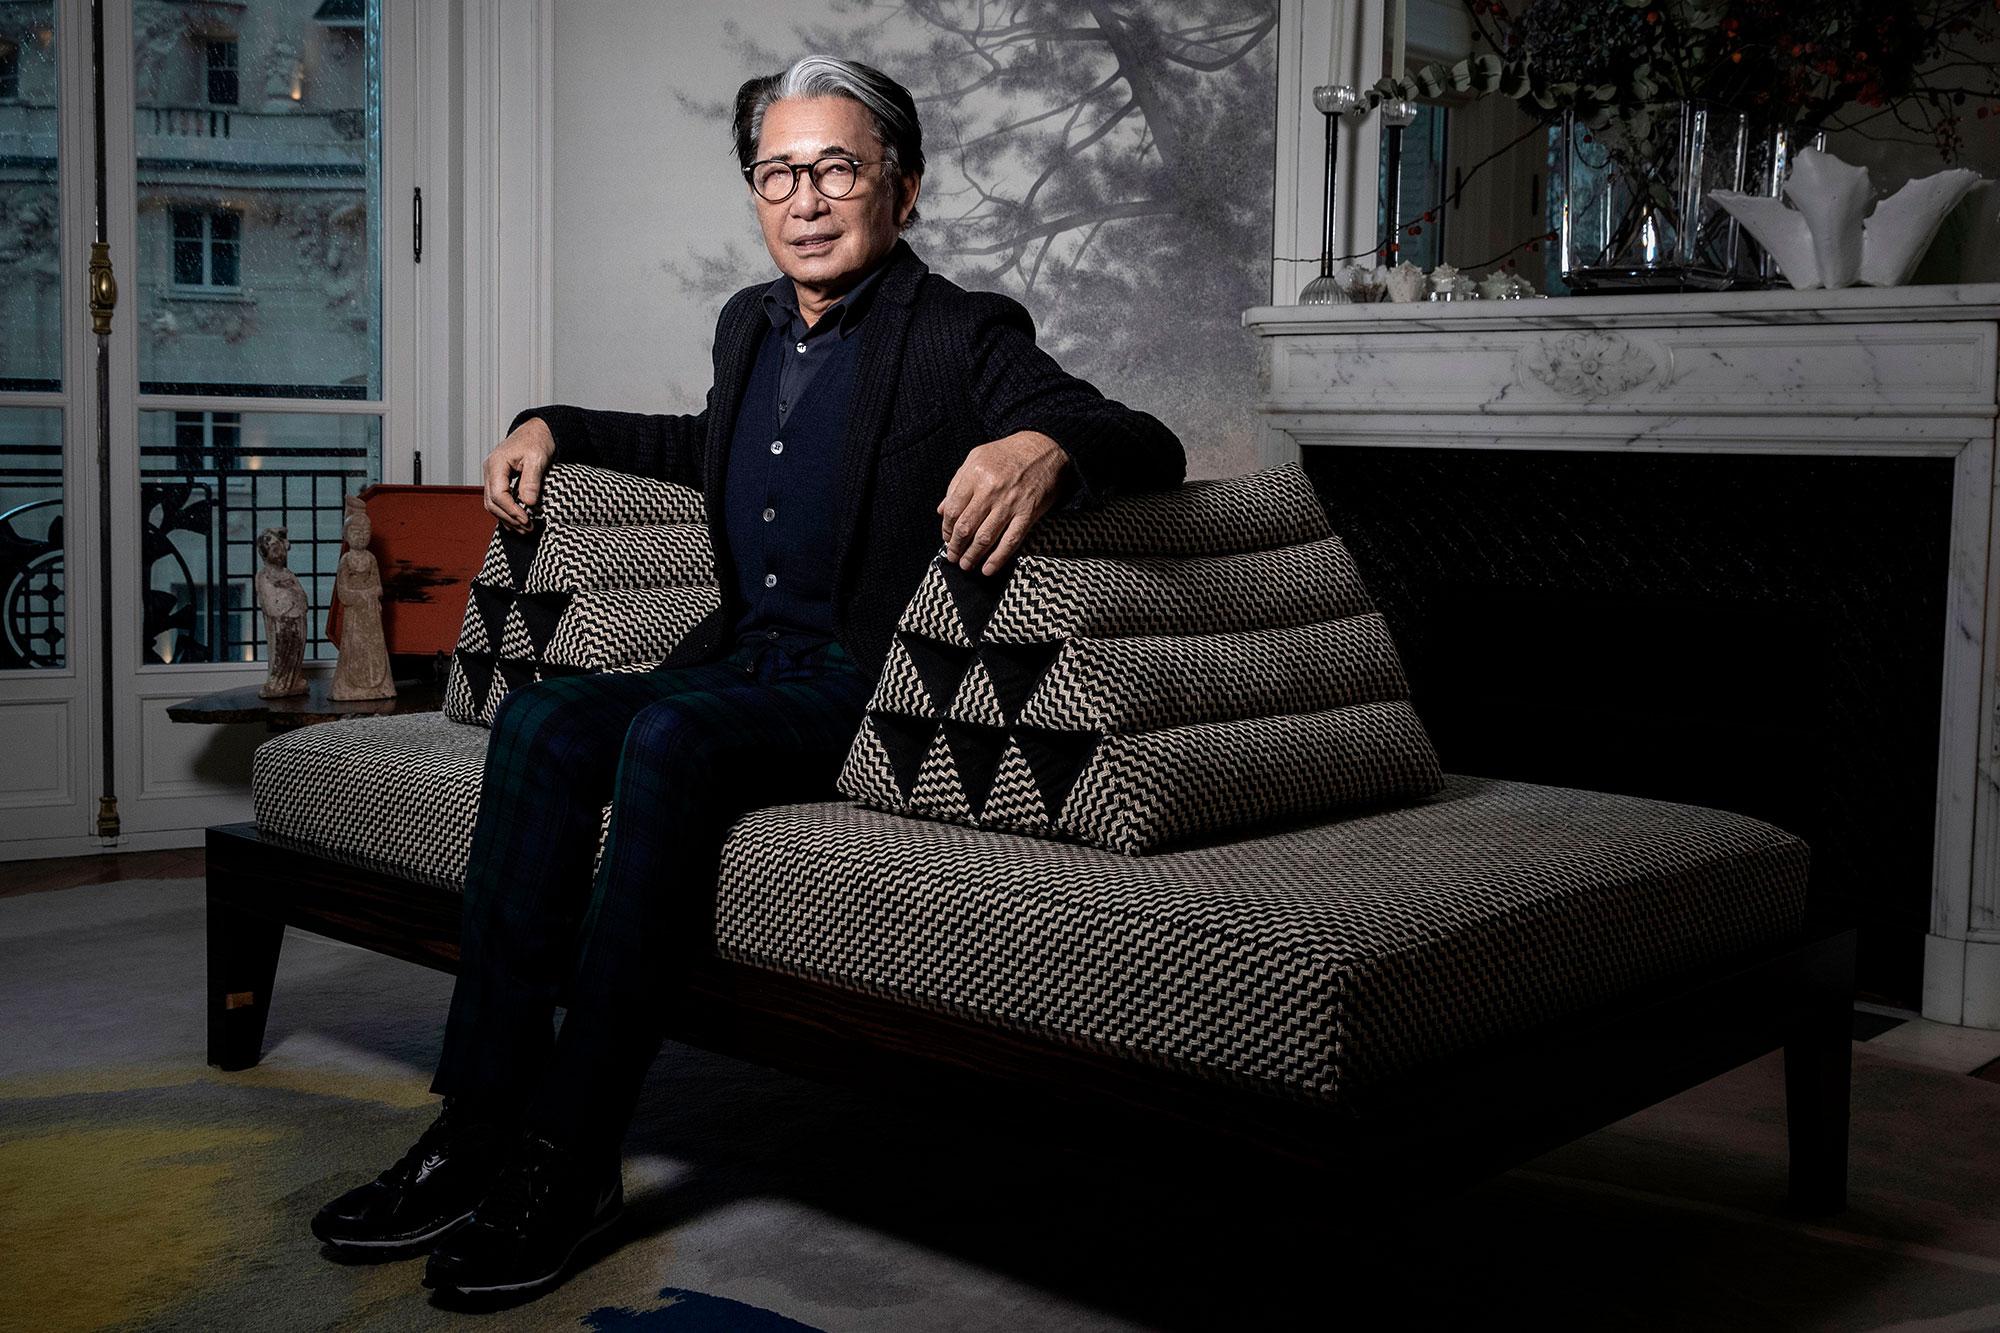 Designer Kenzo Takada Has Died Aged 81